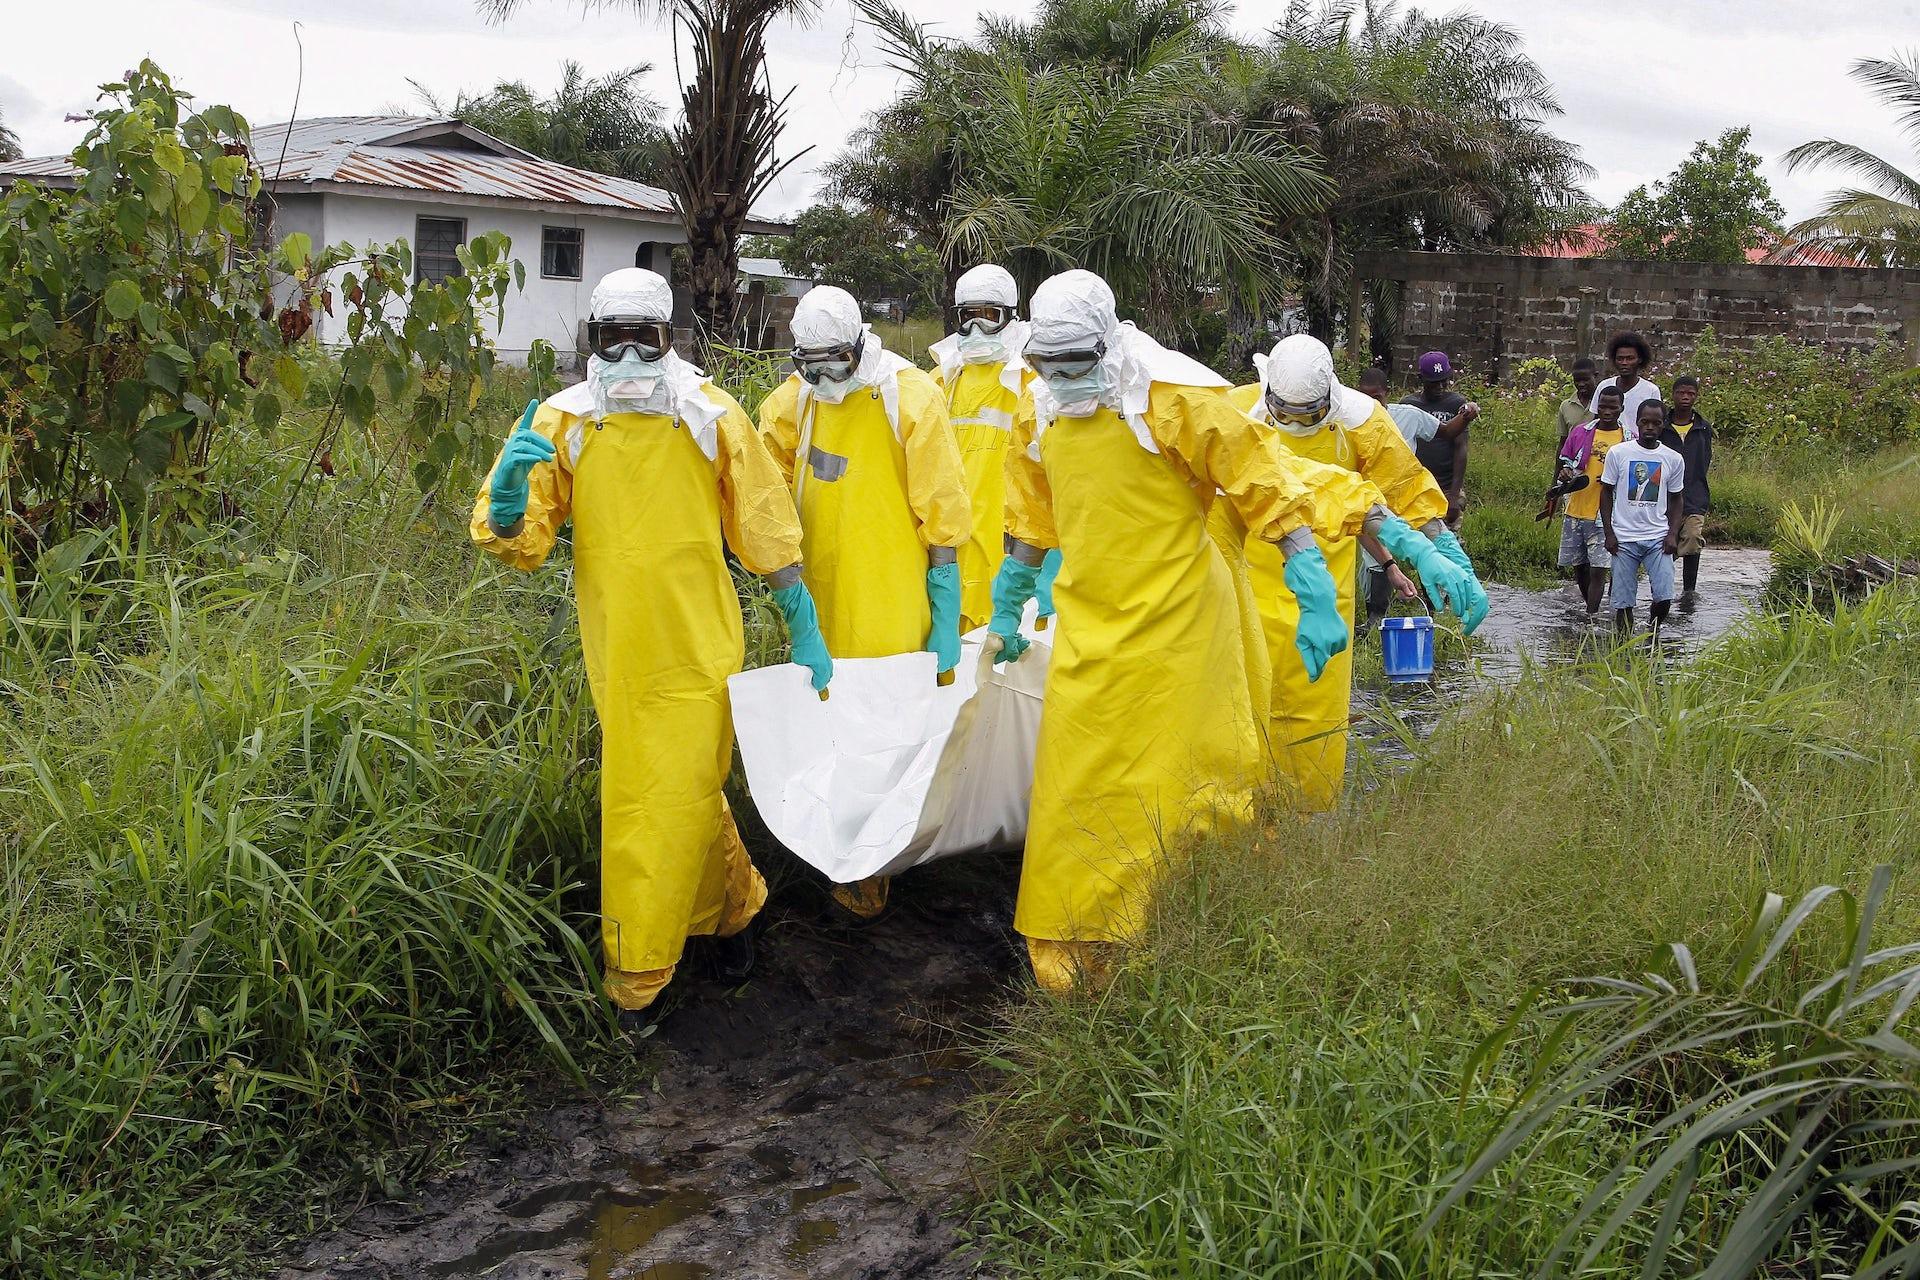 Quarantine works against Ebola but over-use risks disaster